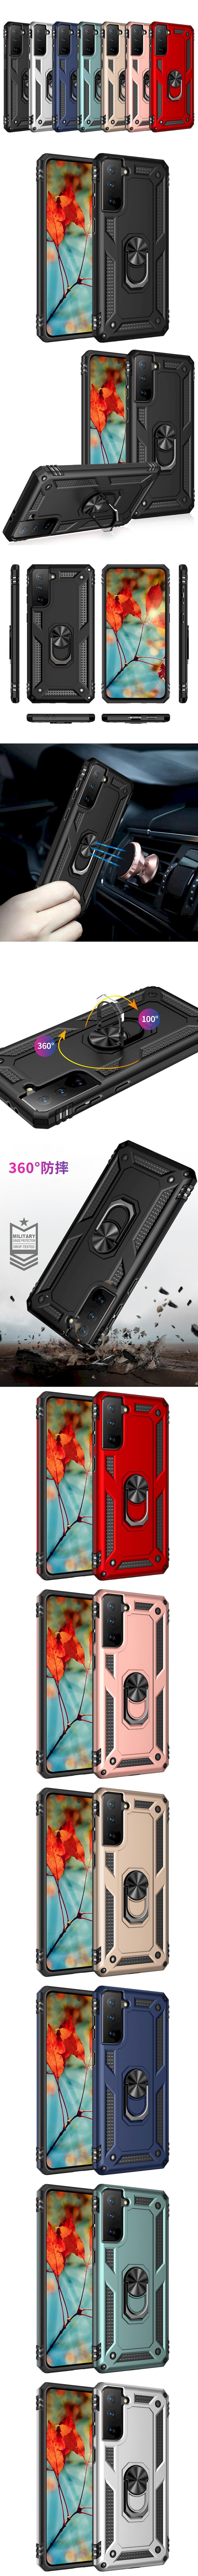 285-Samsung-雙層防撞軟殼+硬殼防摔殼支架手機殼保護套(S21)